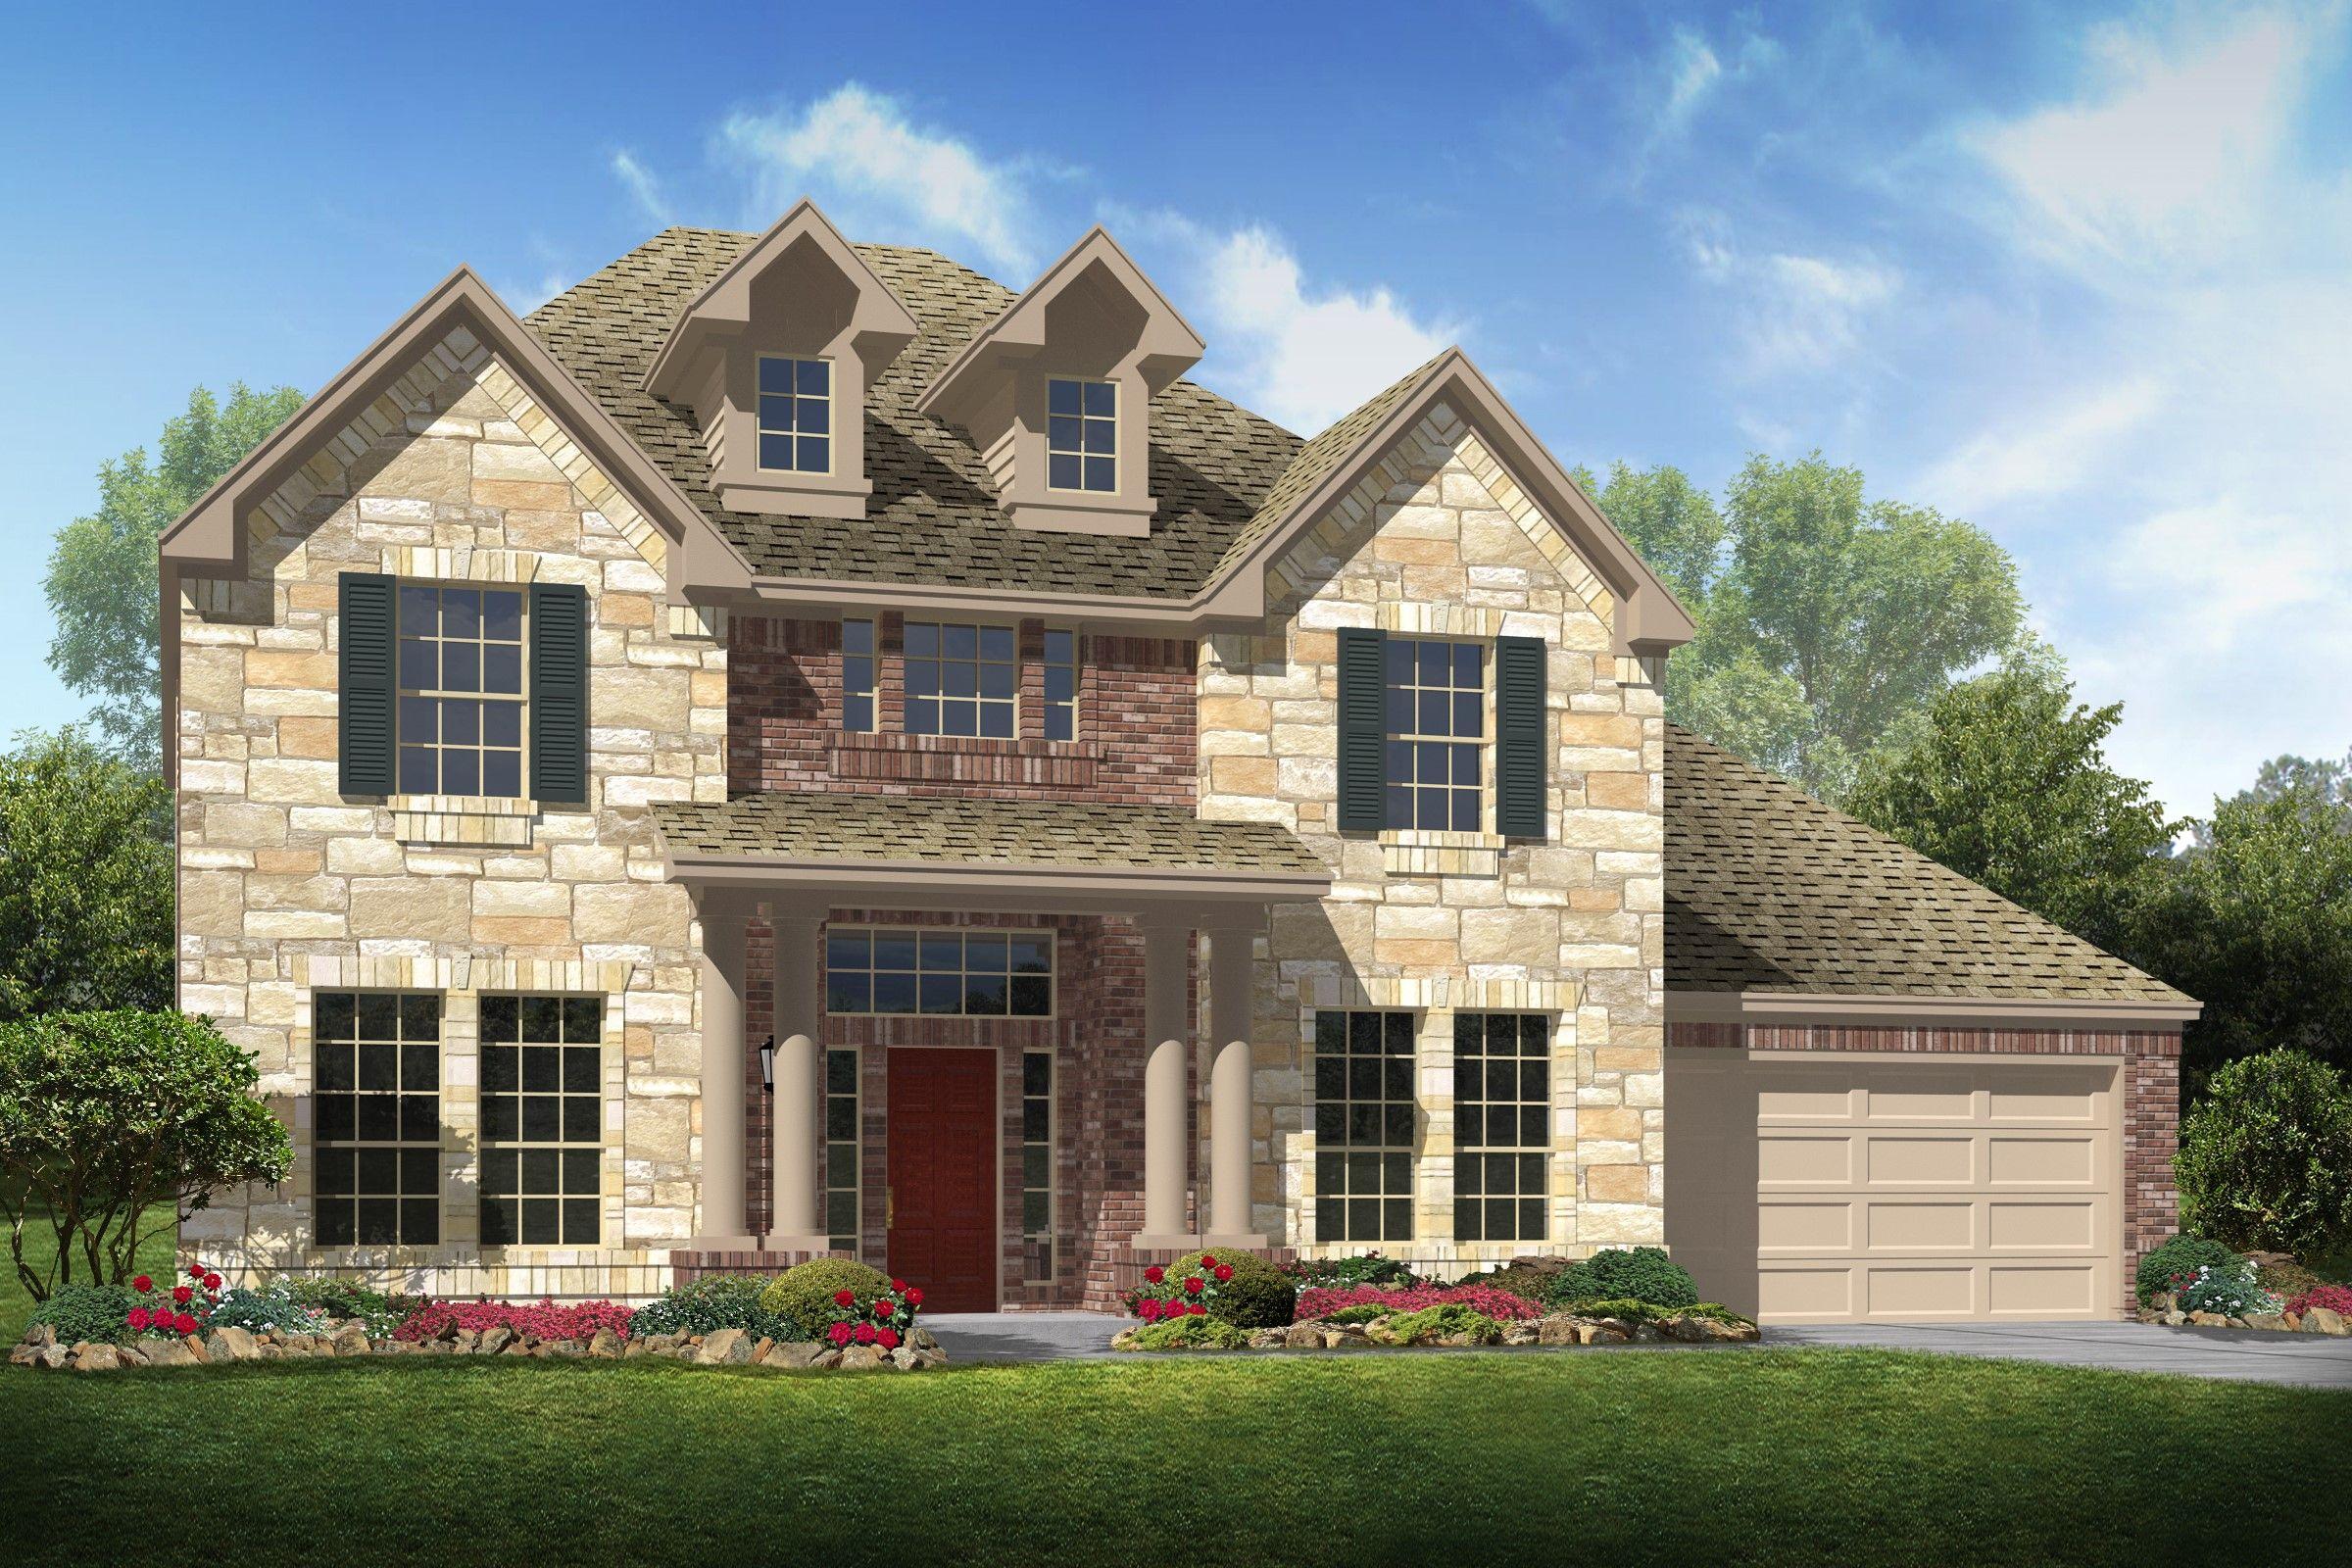 Single Family for Sale at Thunder Bay - Nicholas Mccollum Park Rd & Thunder Bay Beach City, Texas 77523 United States